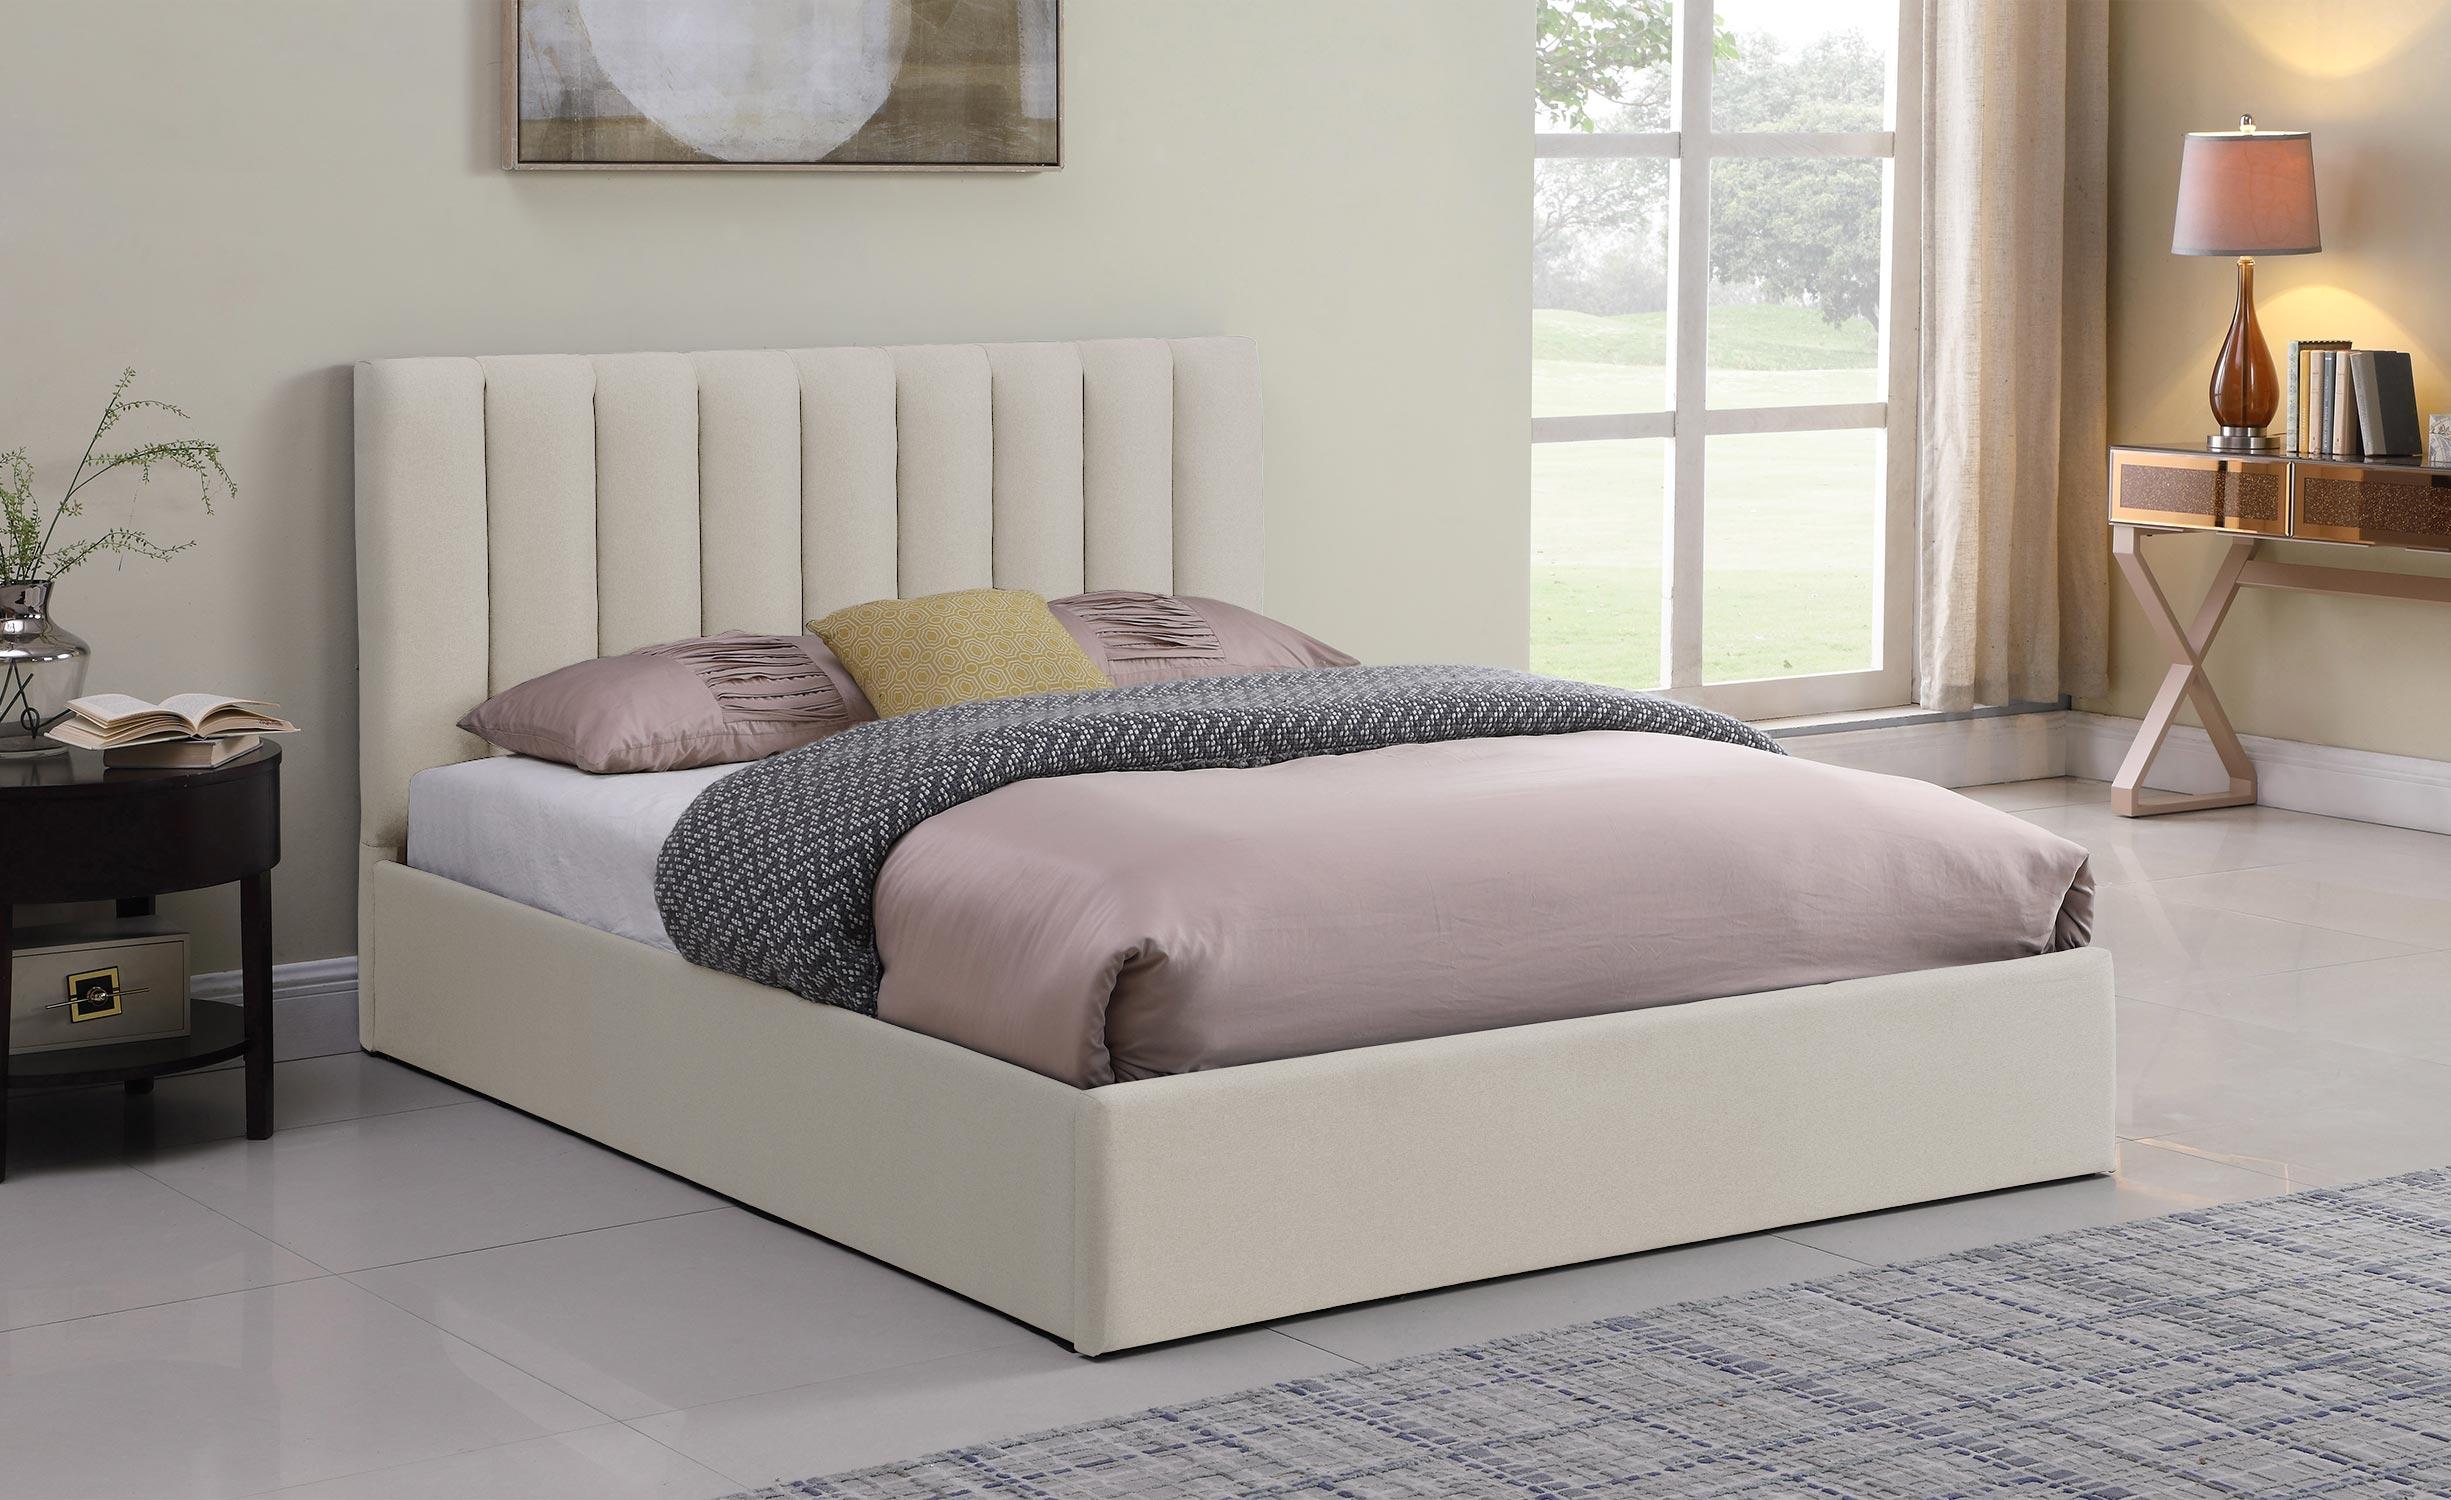 Songe Safe Bed + Beige Stoffen Doos 180cm